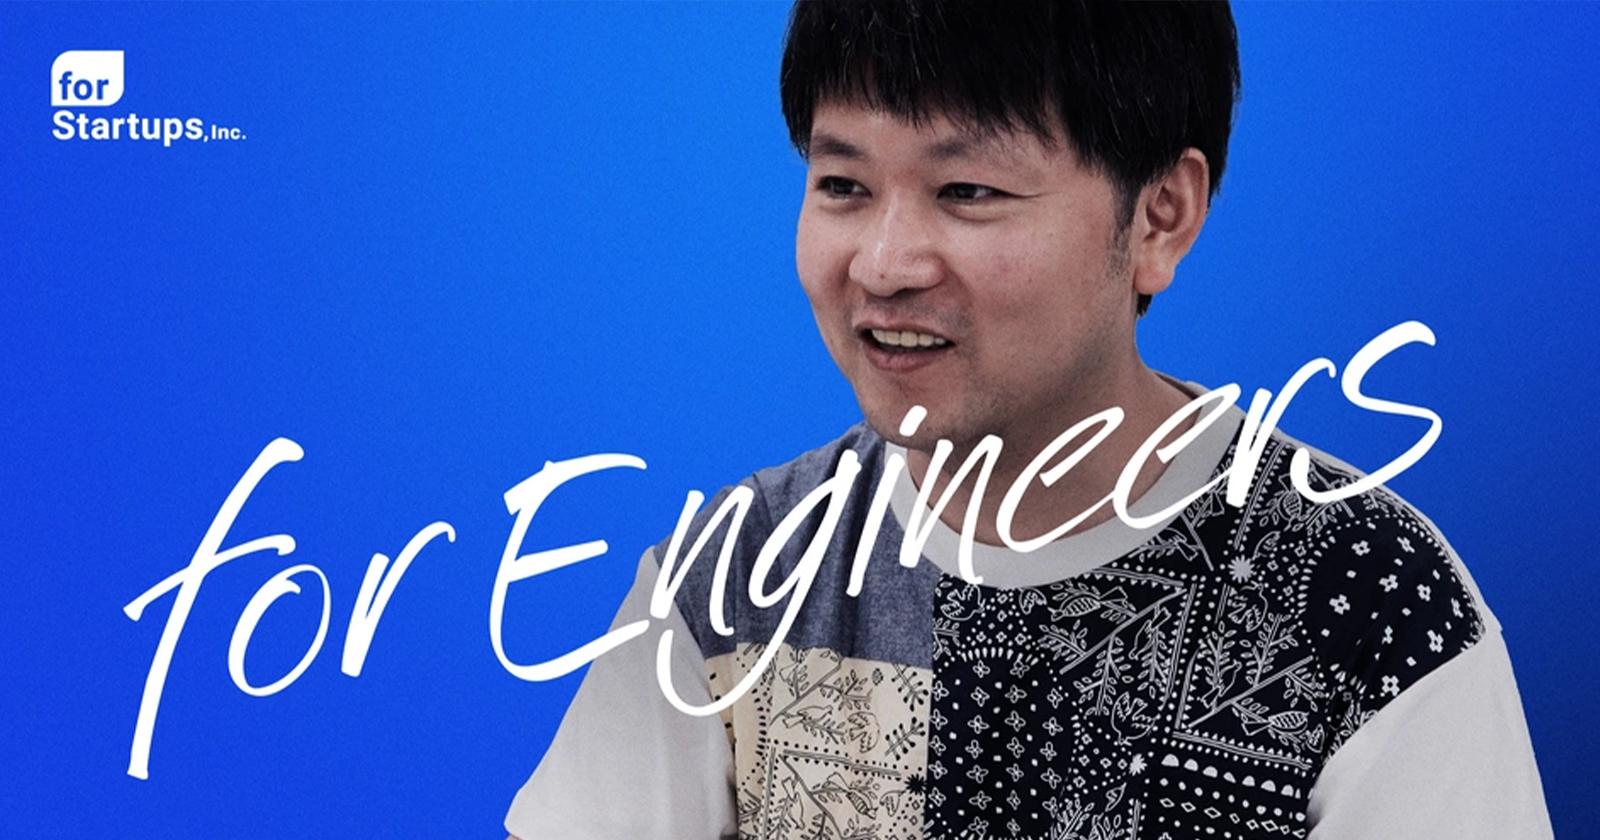 【HEROES5:ヘイ 大橋氏】自分のスキルの再現性を試したい。未完成で自分も一緒に成長できる会社にジョイン